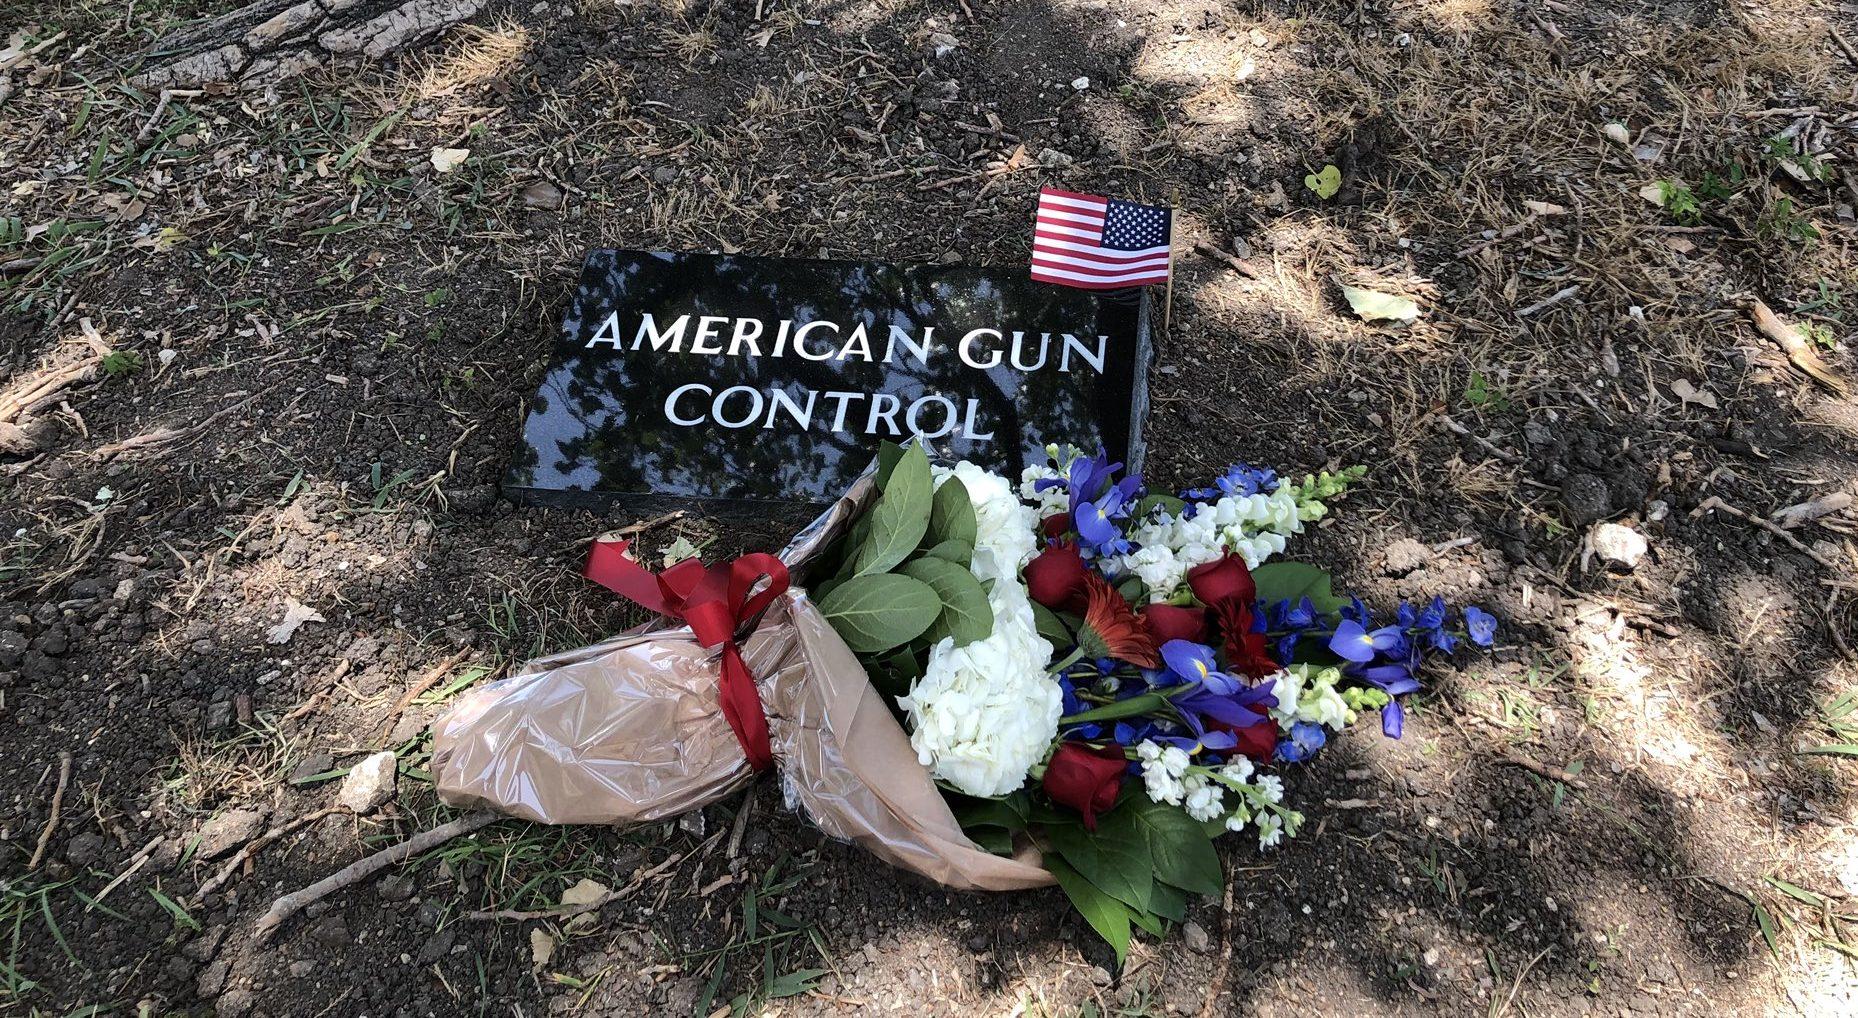 The death of American gun control